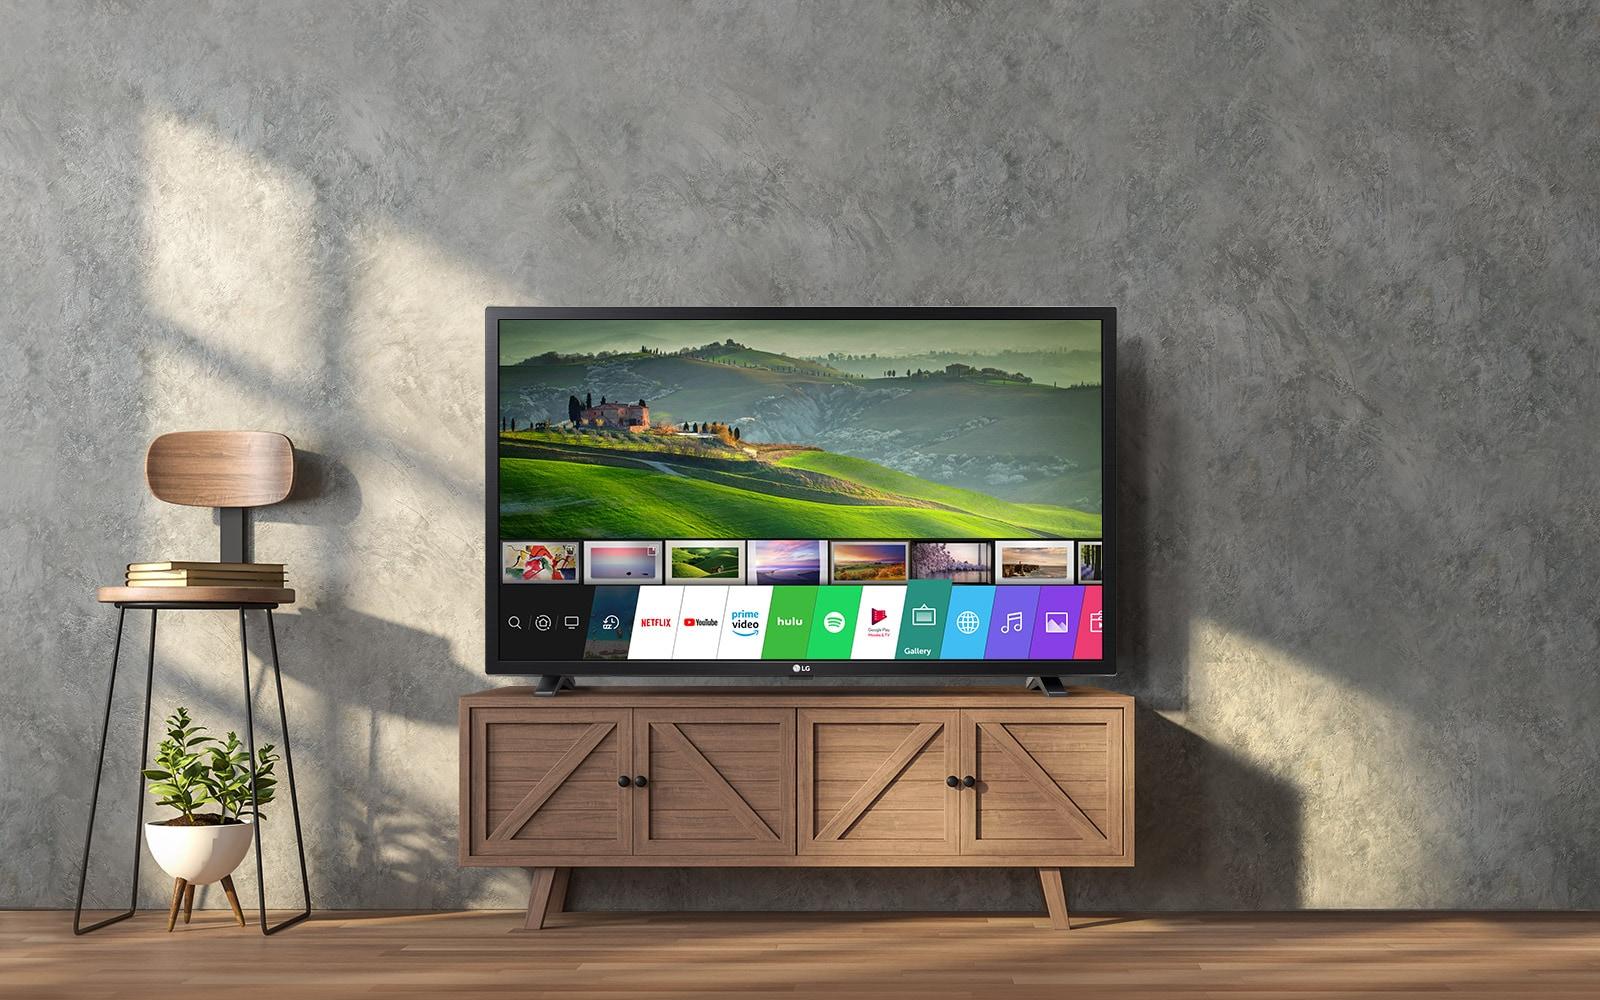 TV-FHD-43-LM57-08-webOS-Smart-TV-Desktop